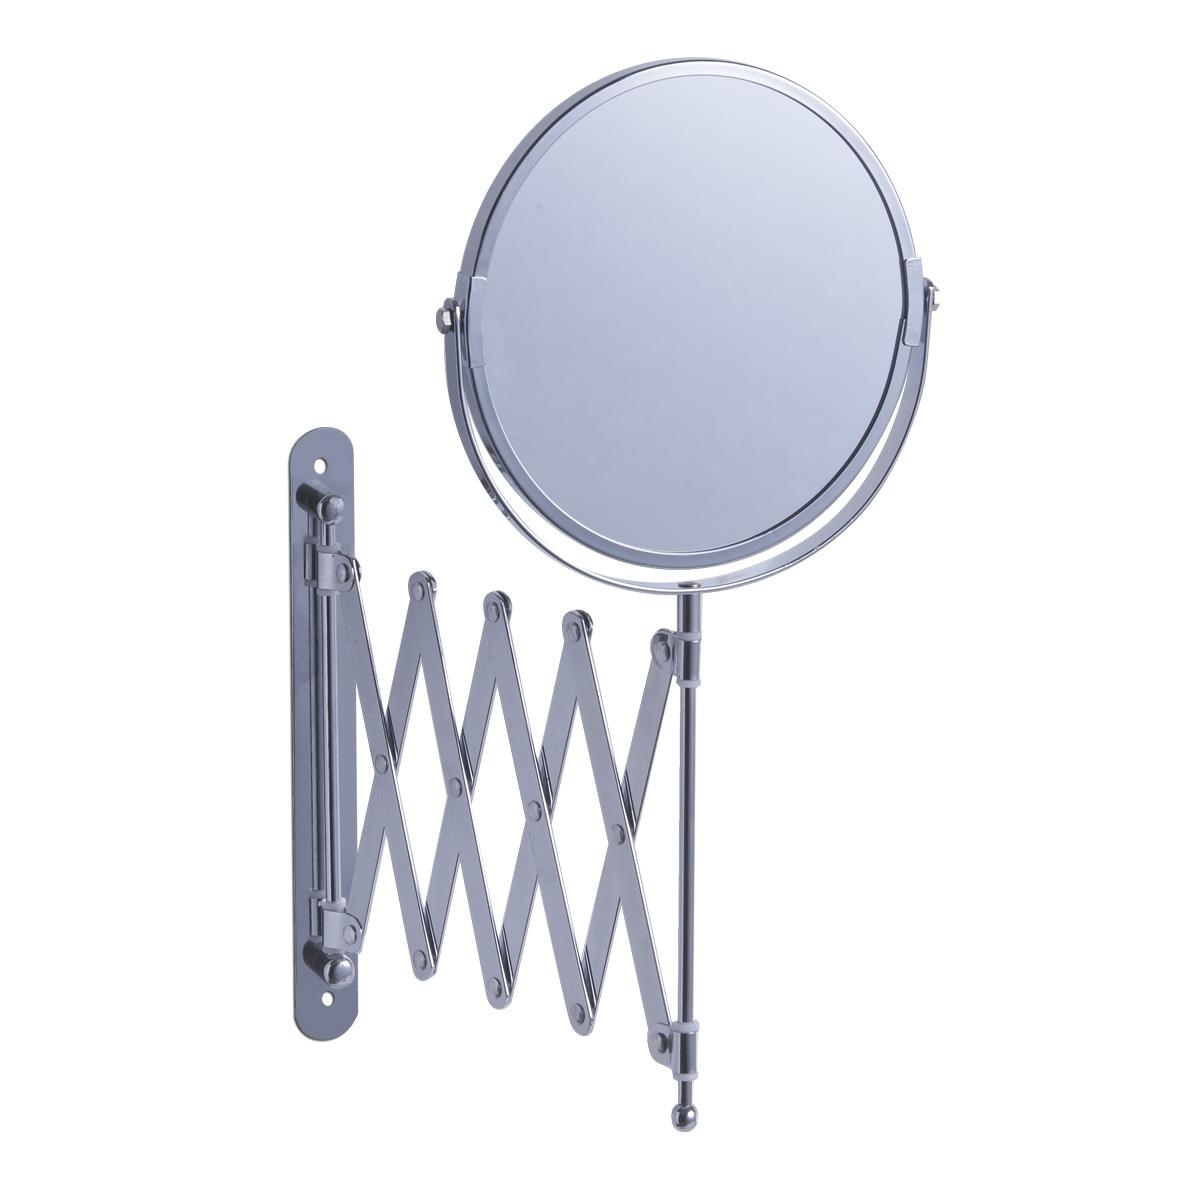 Oglinda cosmetica de perete extensibila Metal Cromat O 17xl9/45xH37 cm